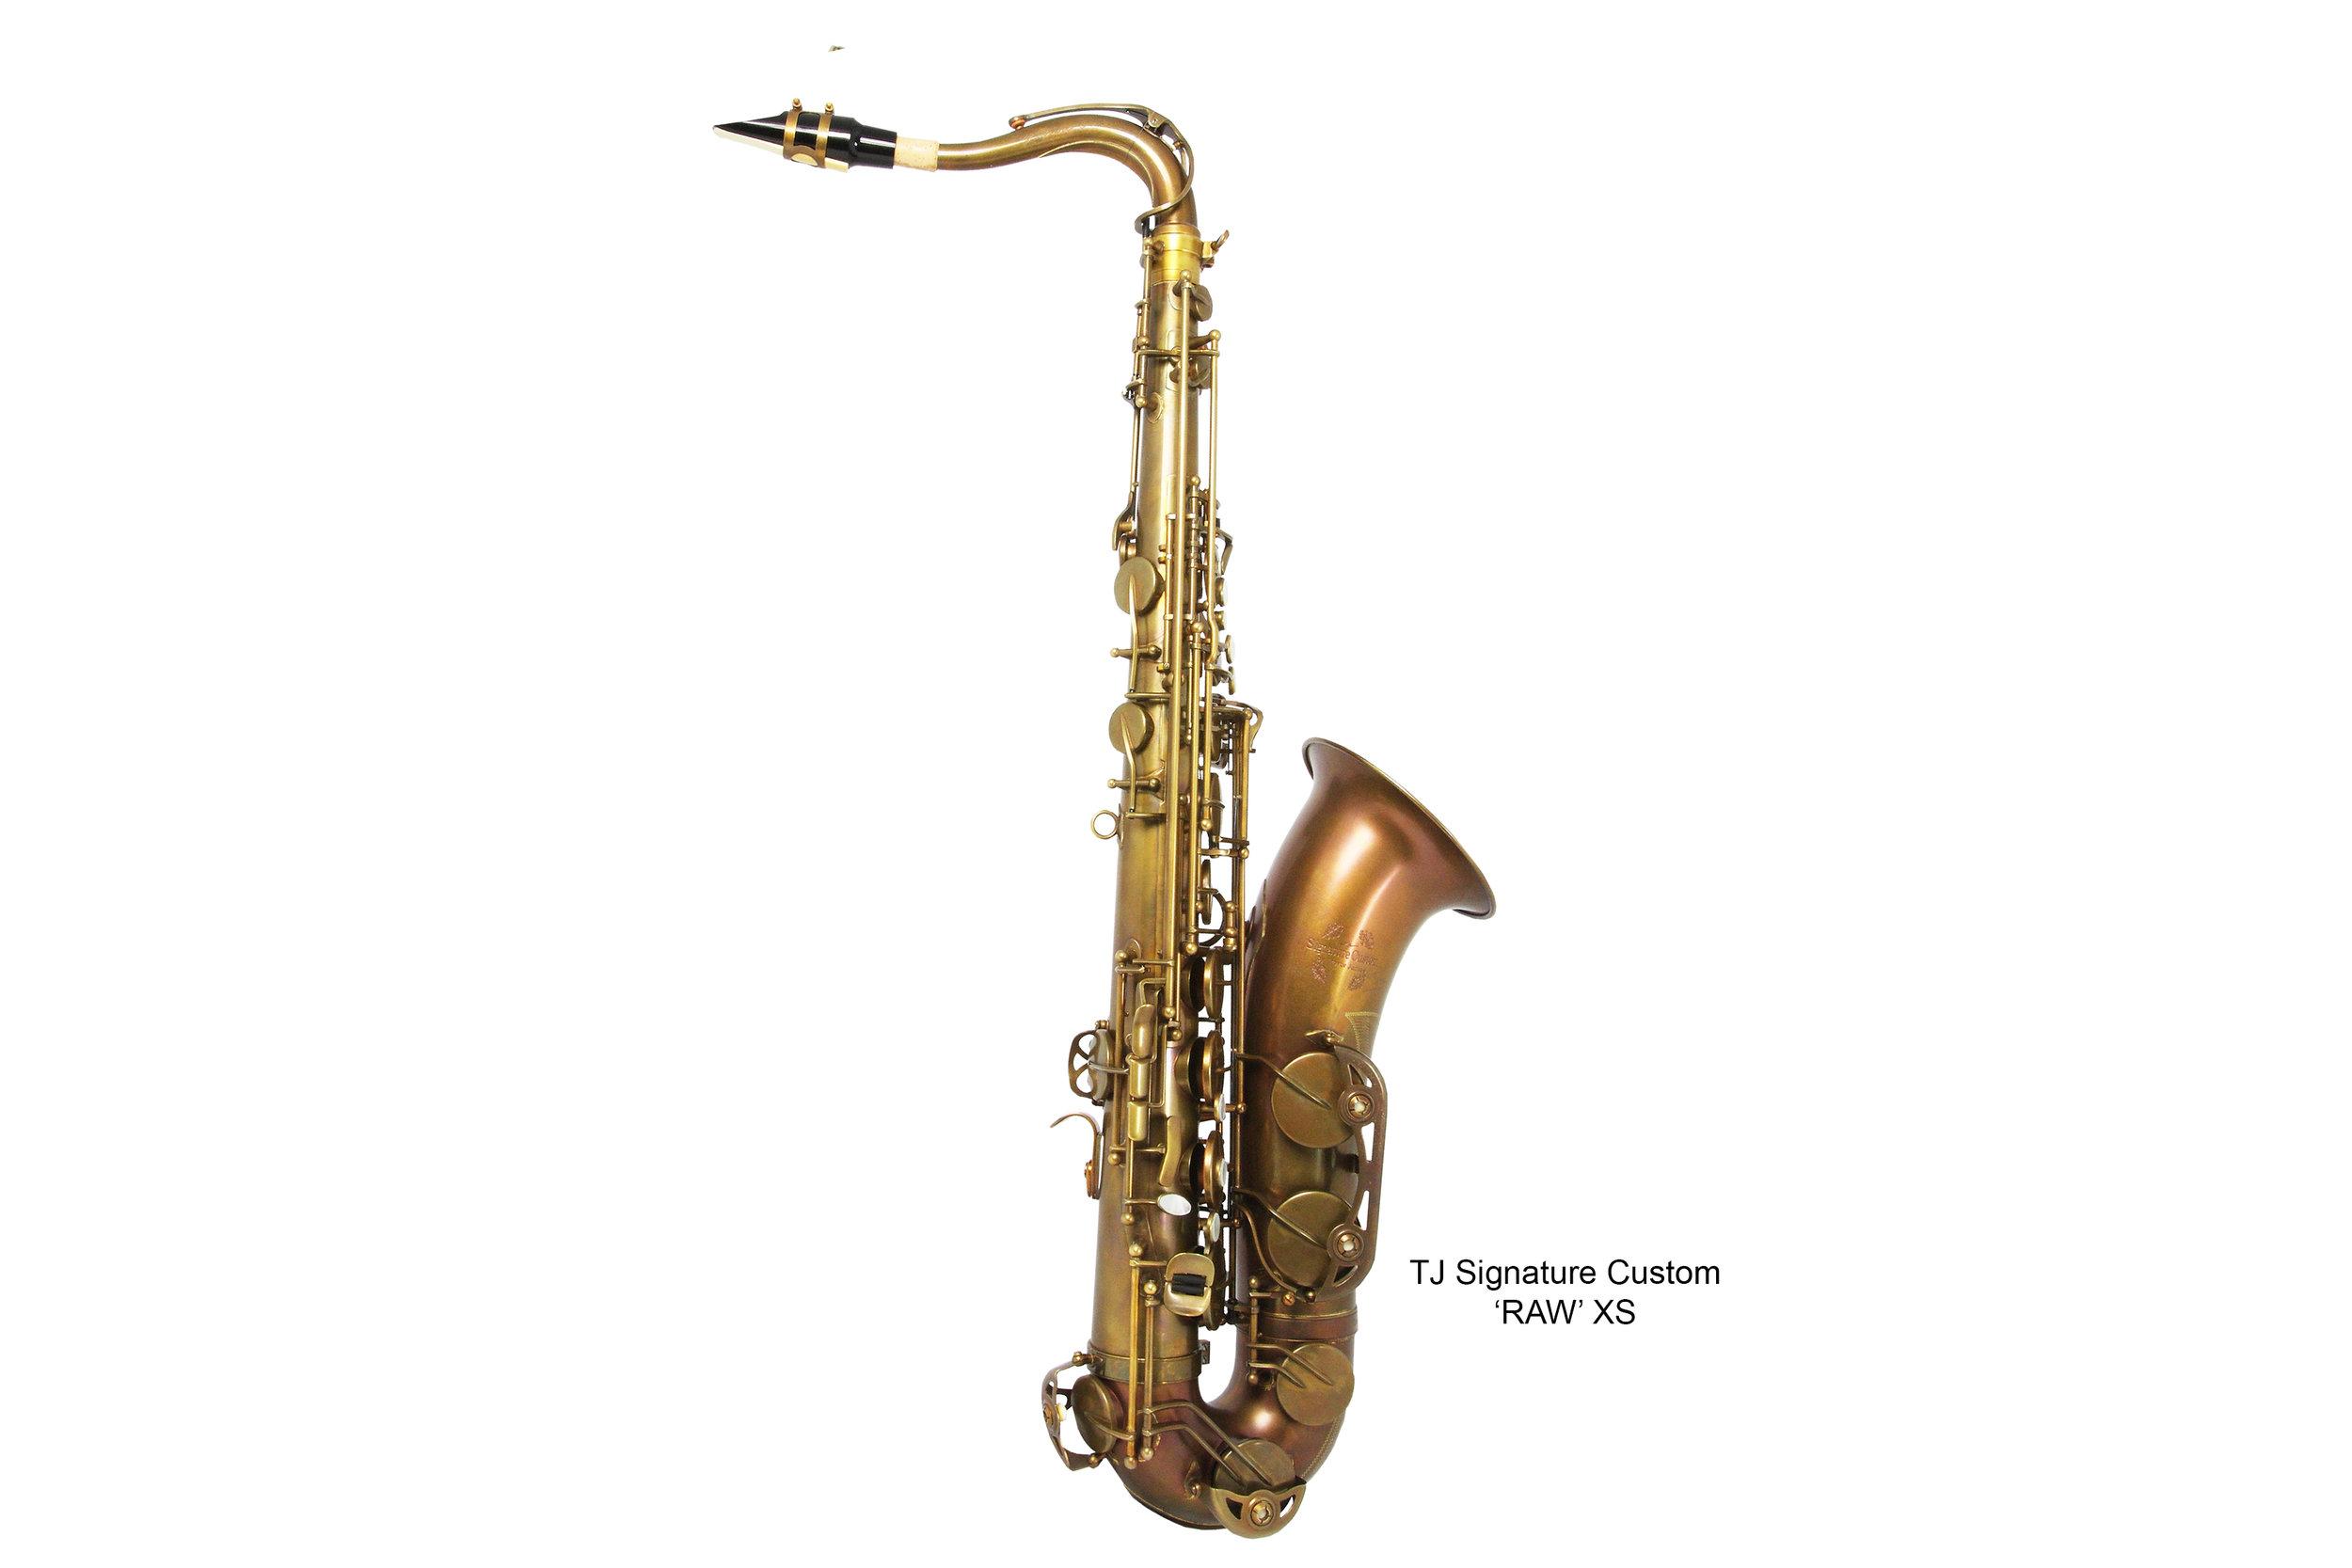 RAW tenor sax for website.jpg